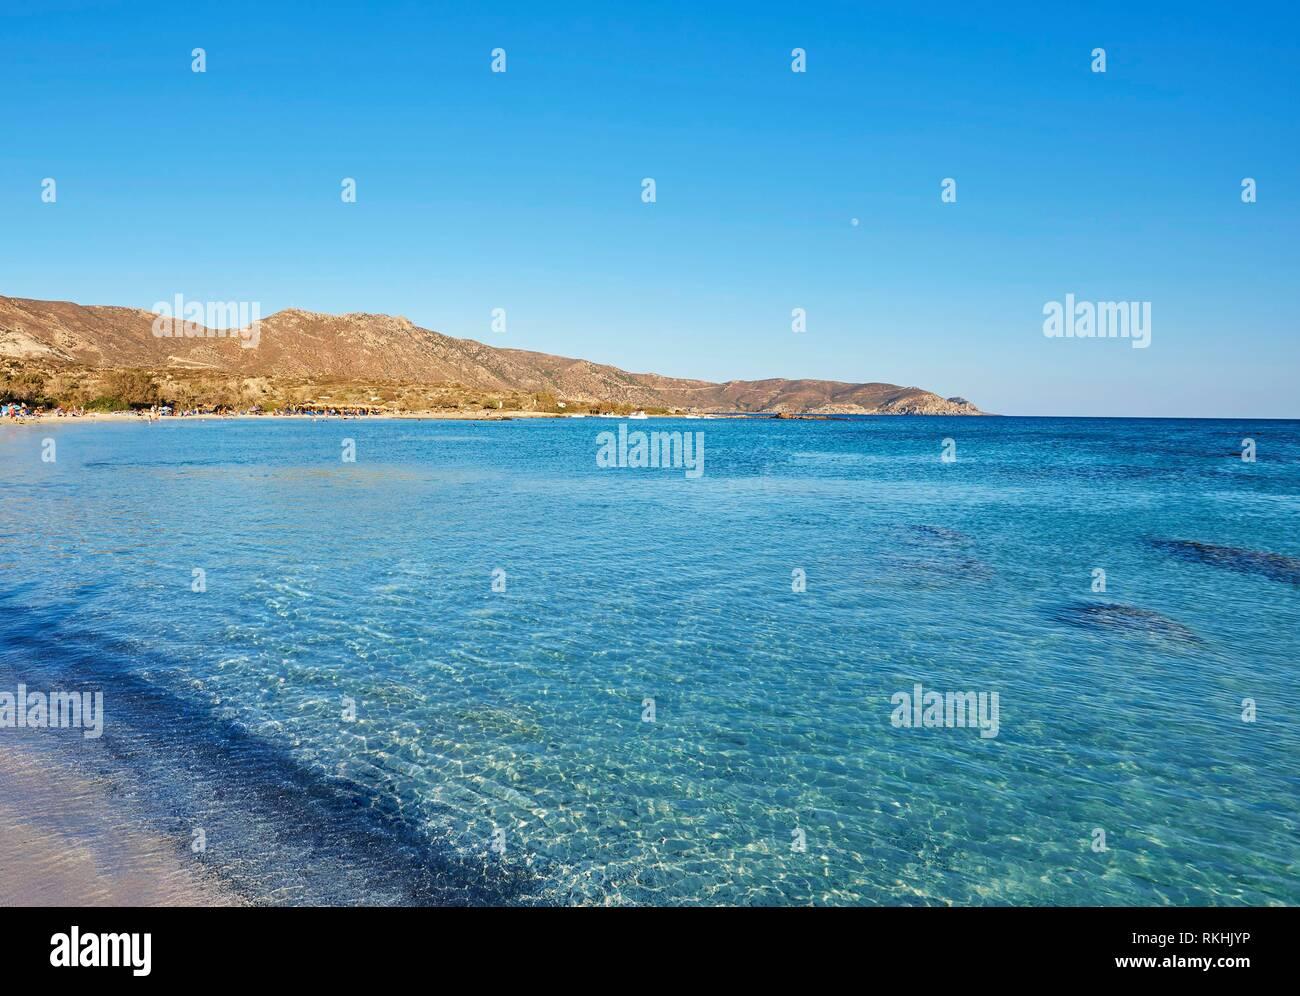 Clear blue water, Elafonisi beach, Crete, Greece Stock Photo